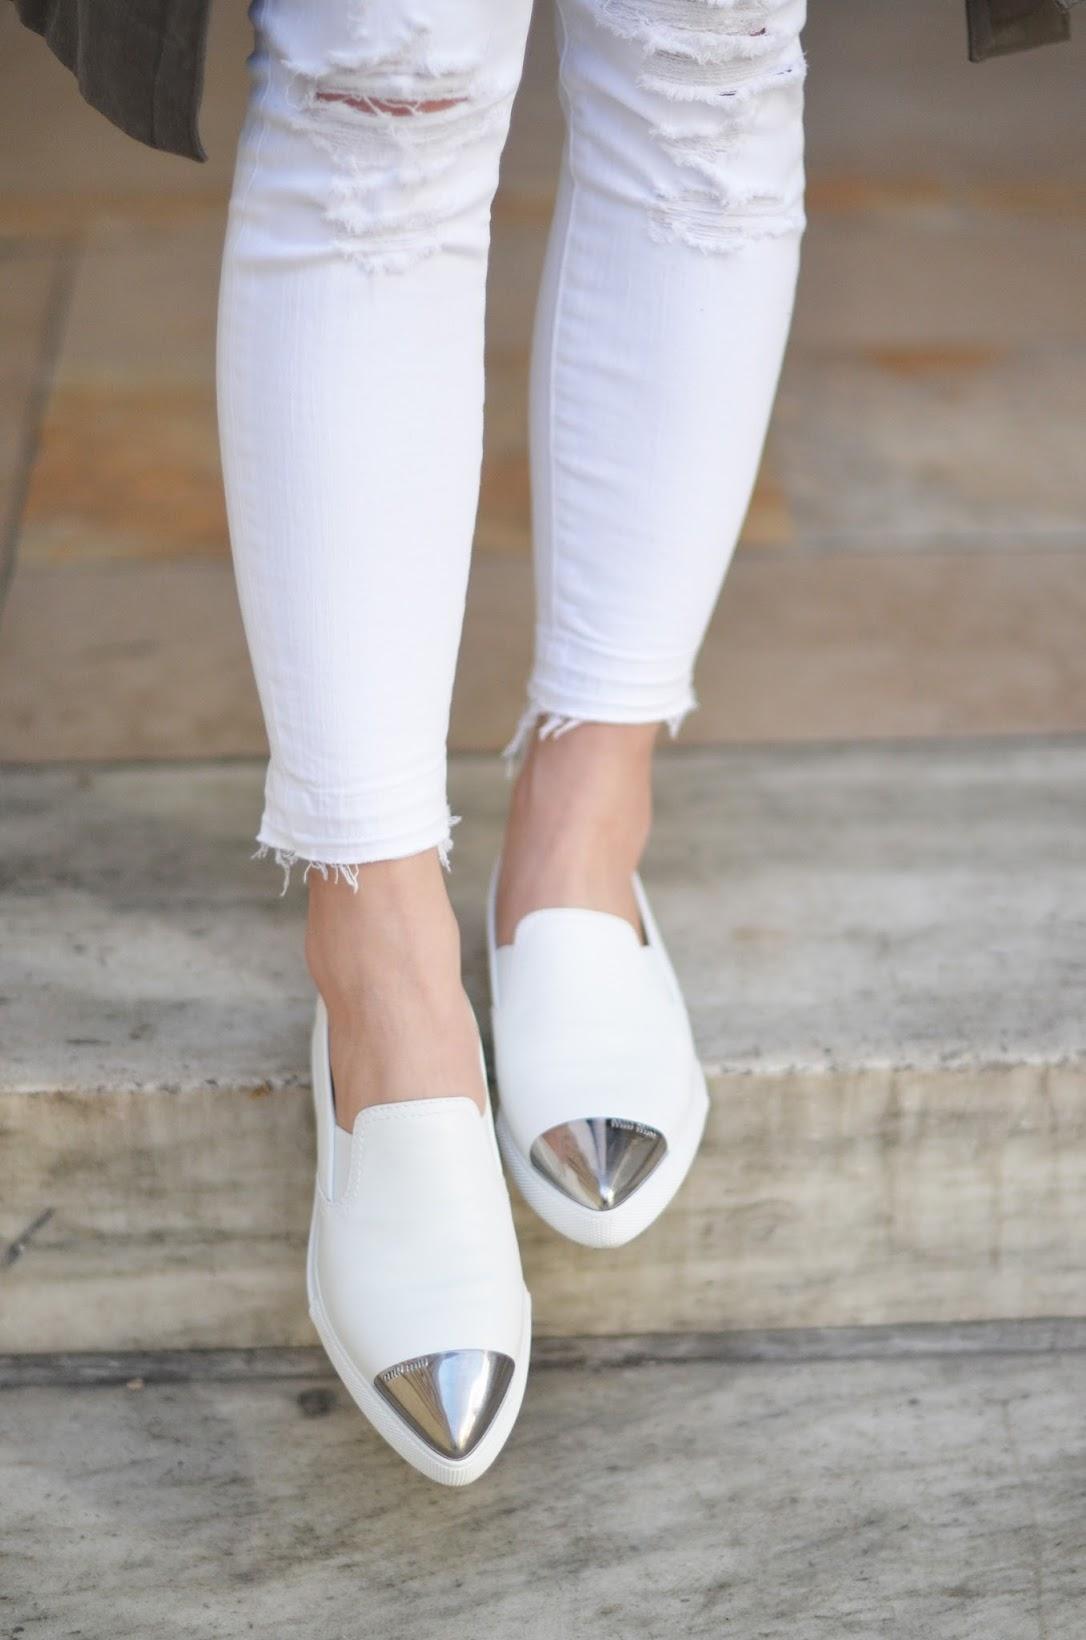 nypl outfit, white jeans, white miu miu slip on sneakers, jbrand